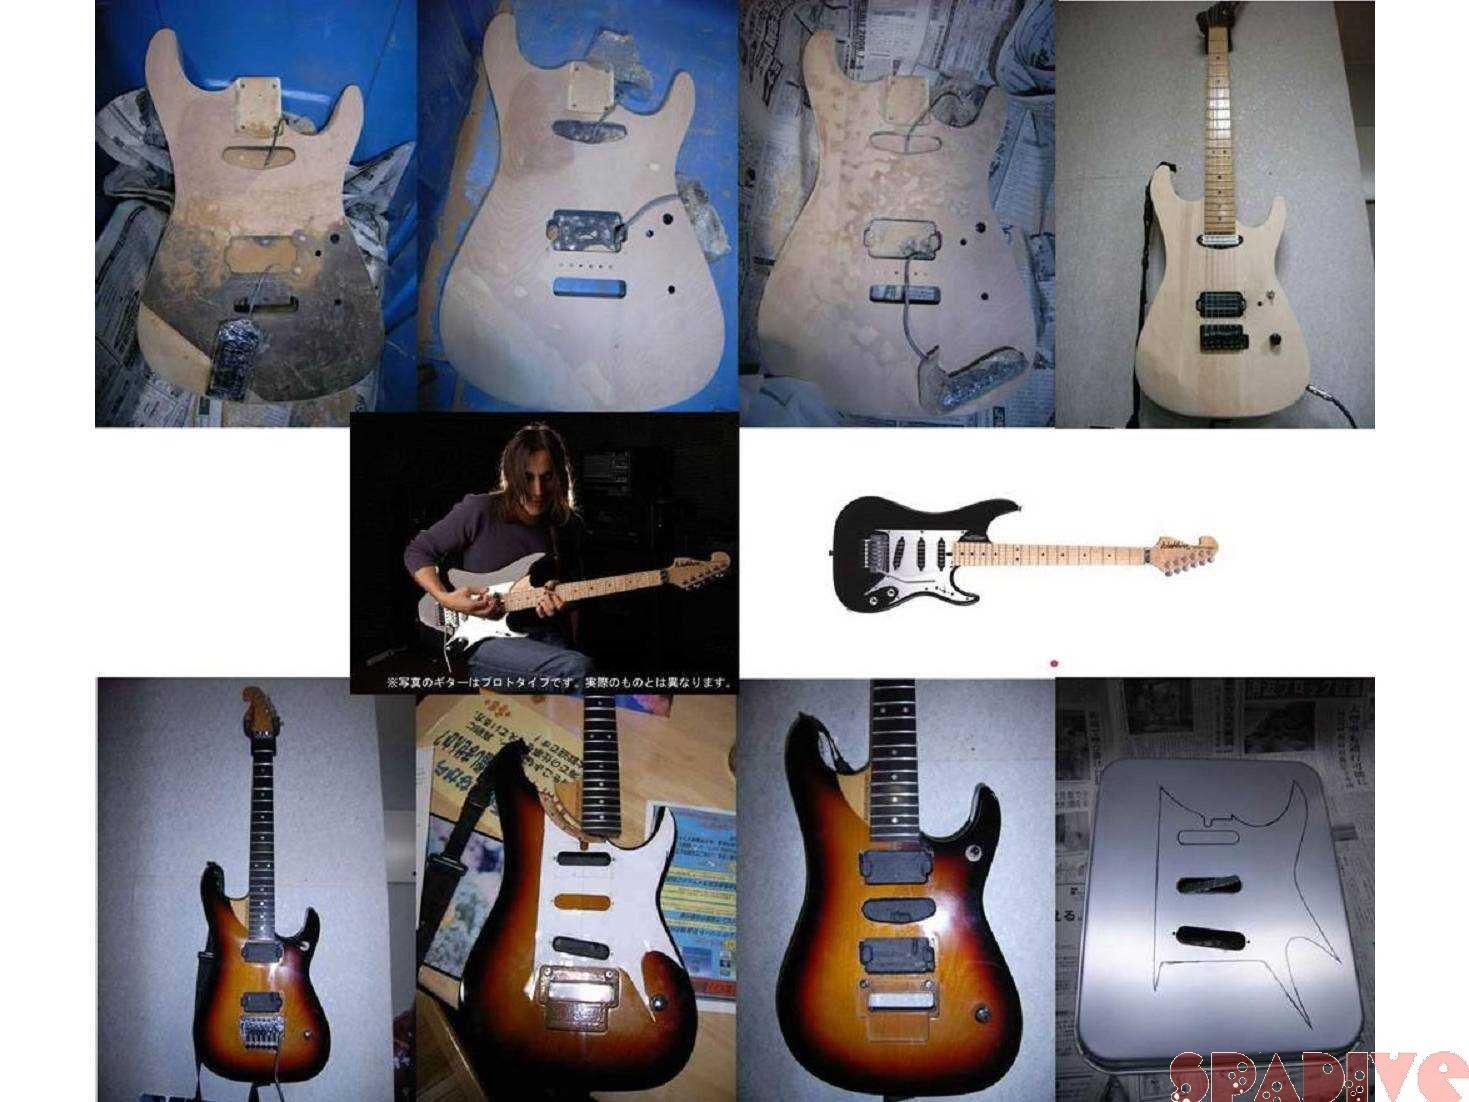 CHARVELギターボディー改造その5&Washburn N4改造N5化|3/17/2007